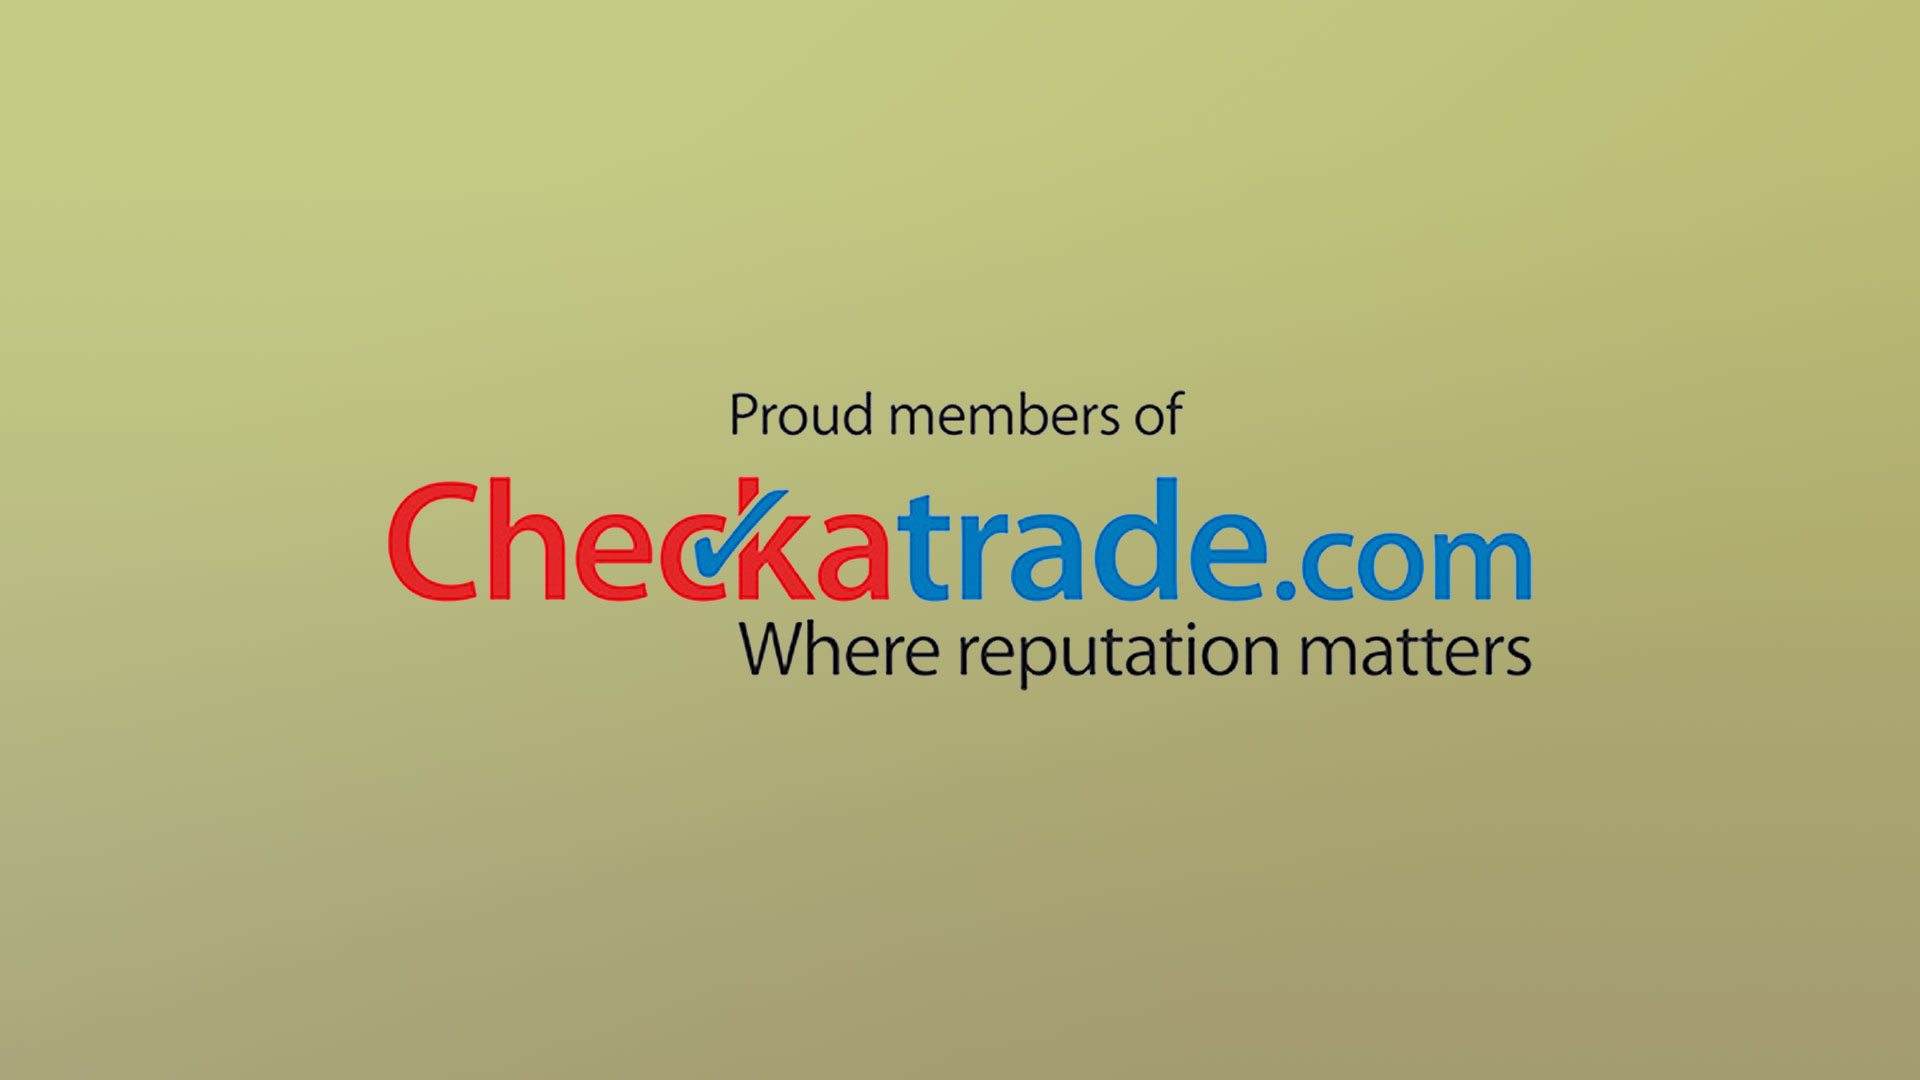 WordPress Checkatrade Plugin